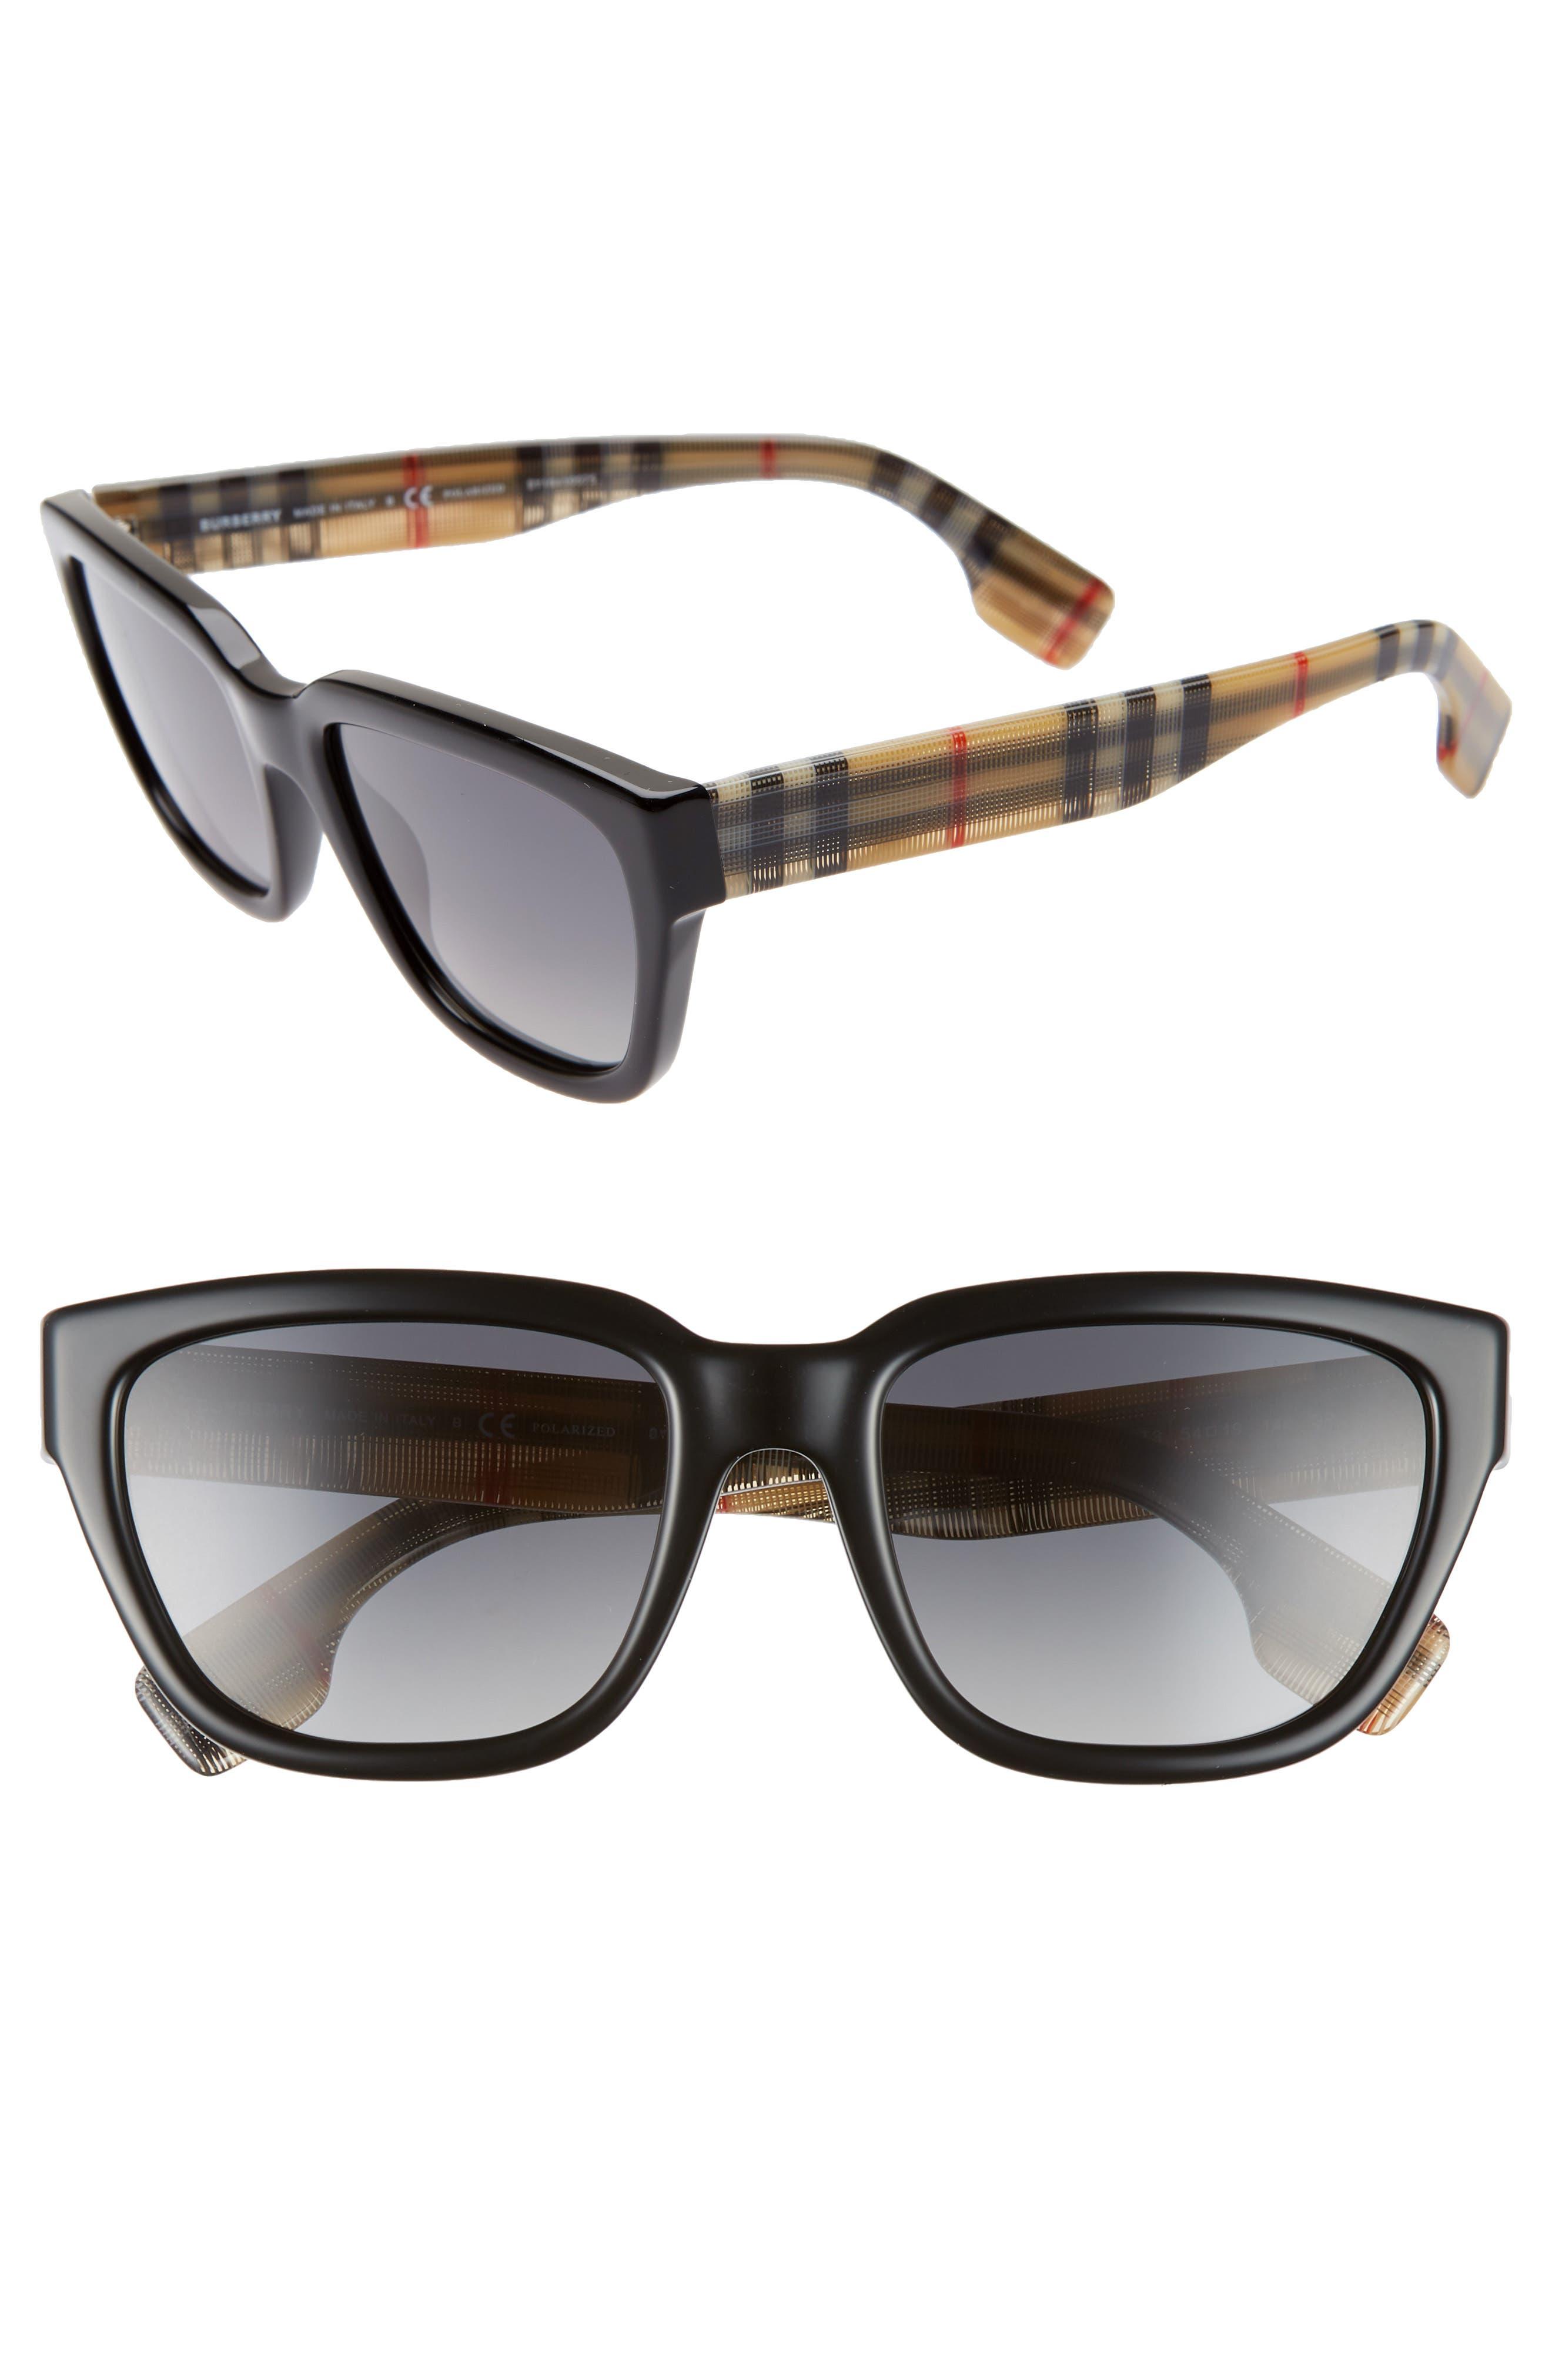 54mm Polarized Gradient Square Sunglasses,                         Main,                         color, BLACK/ BLACK GRADIENT